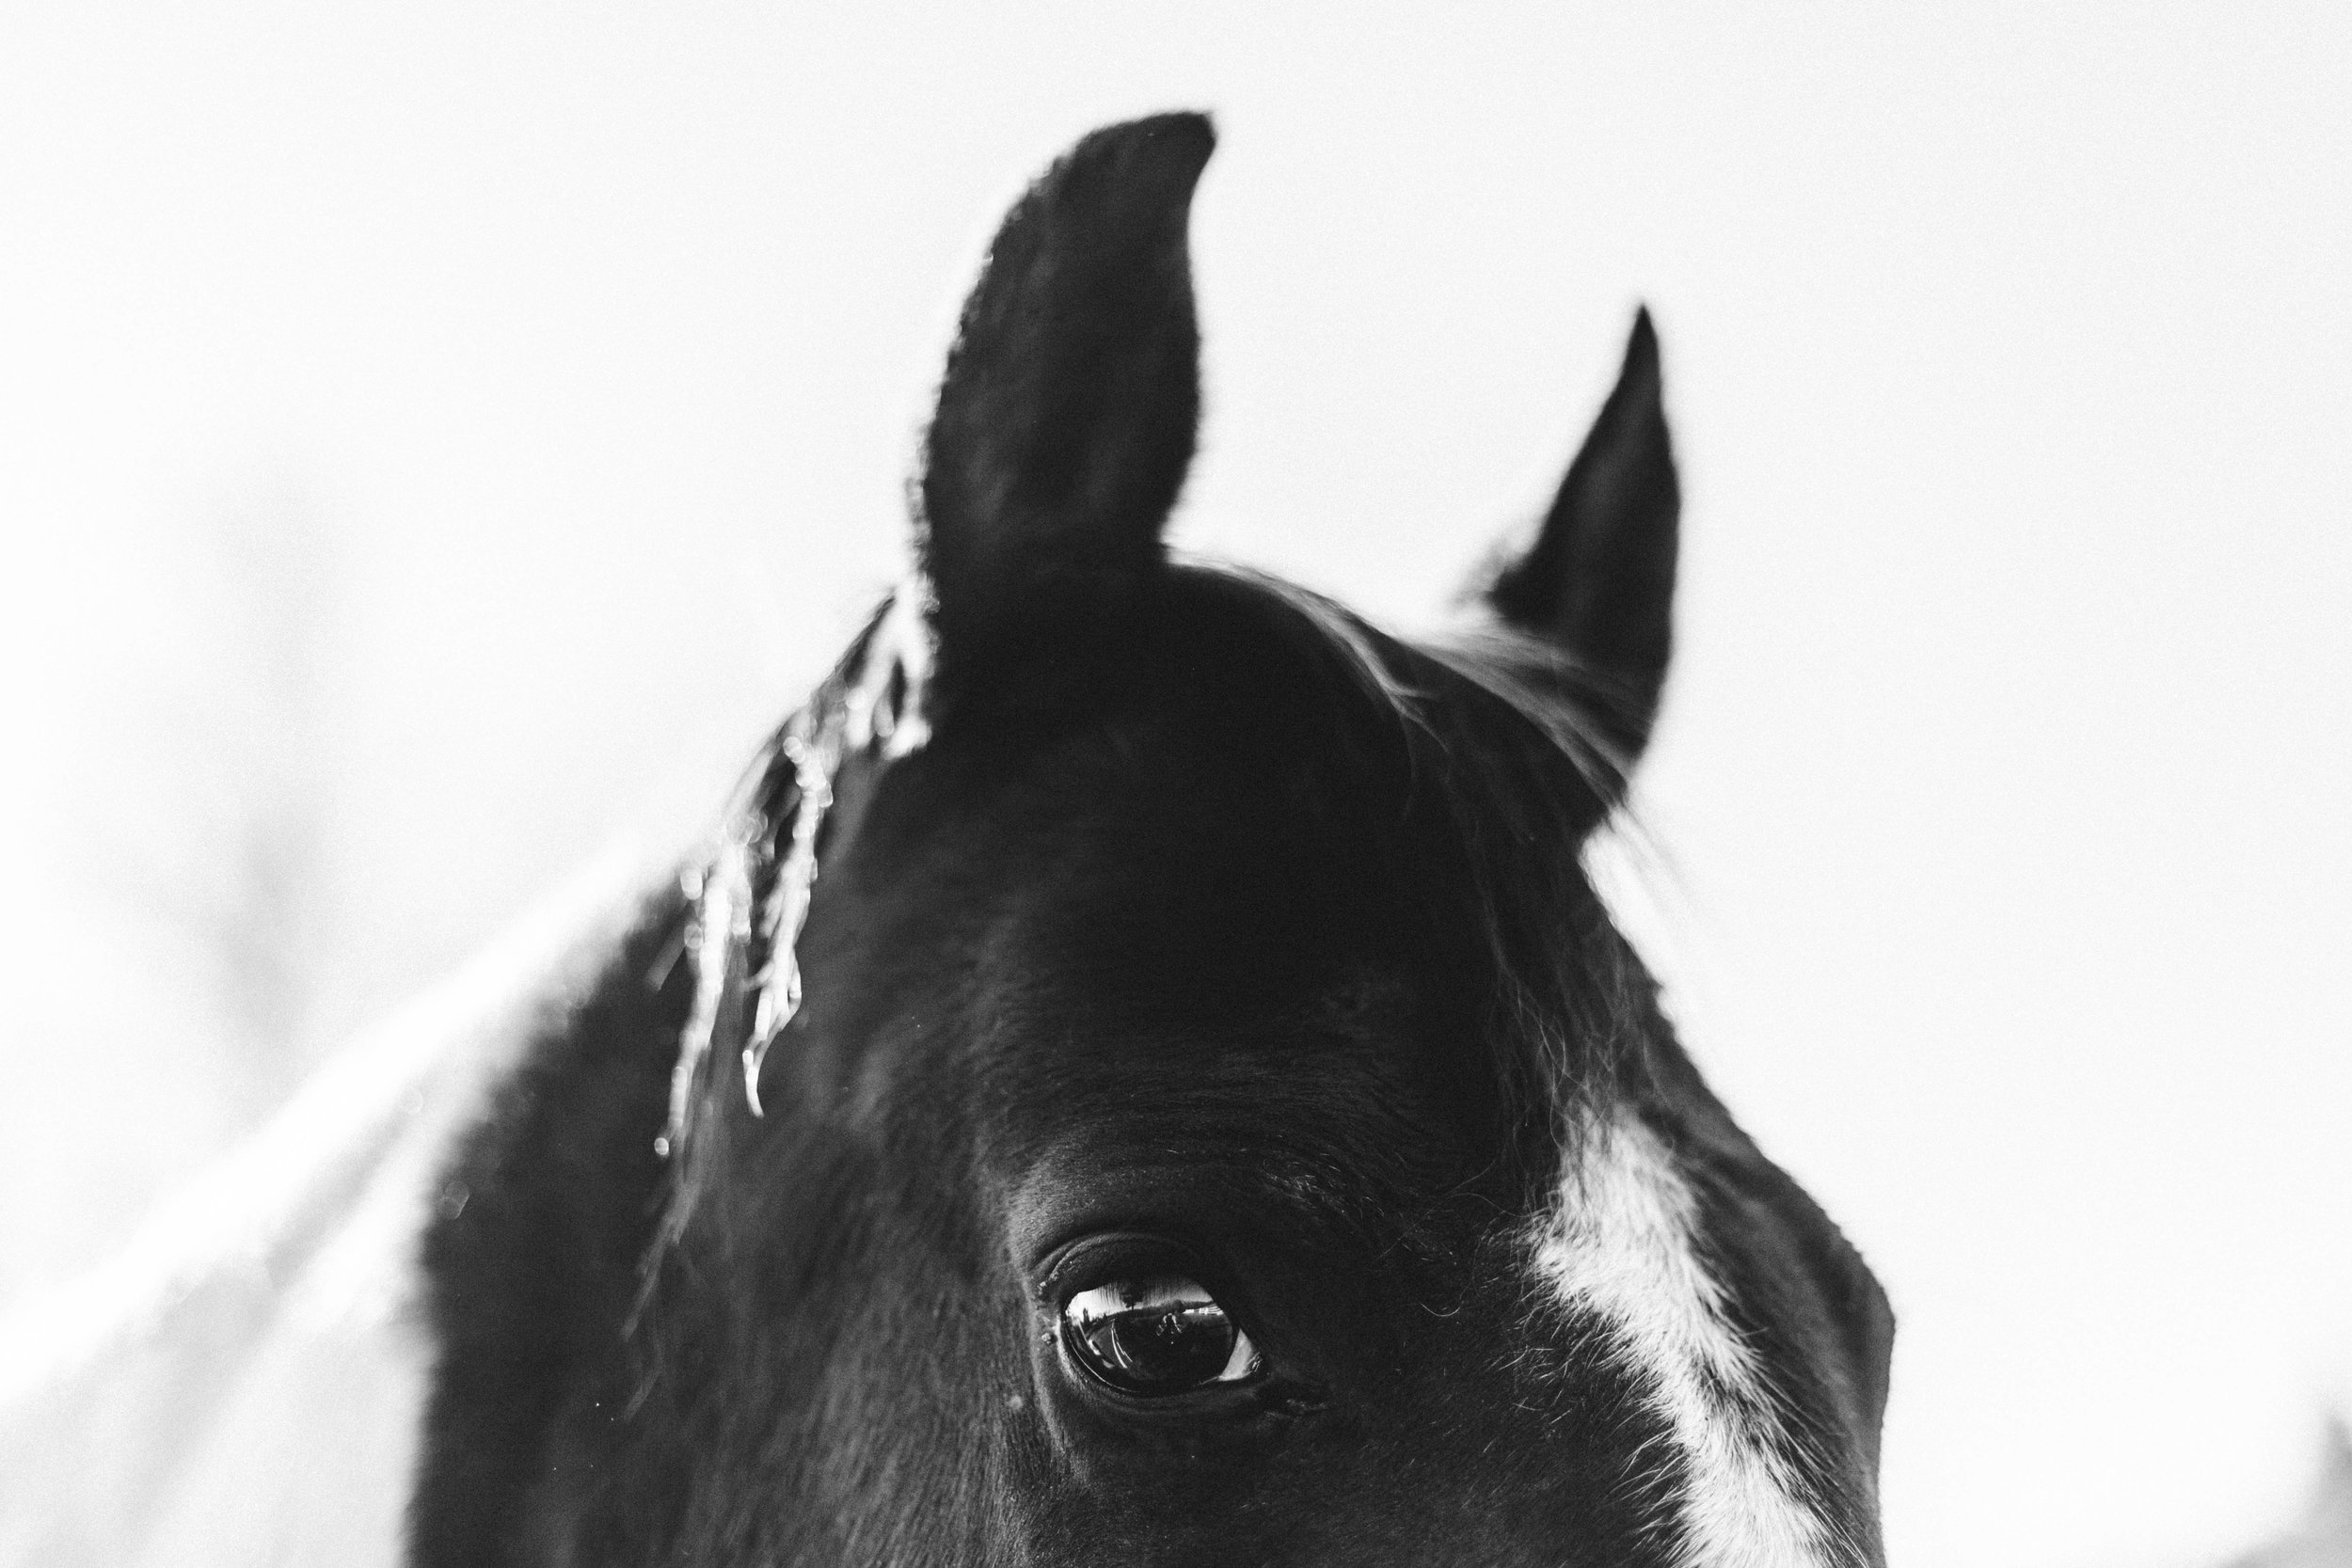 Horse Farm Engagment - Sabrina Leigh Studios - Northern Michigan Wedding Photographer 37.jpg